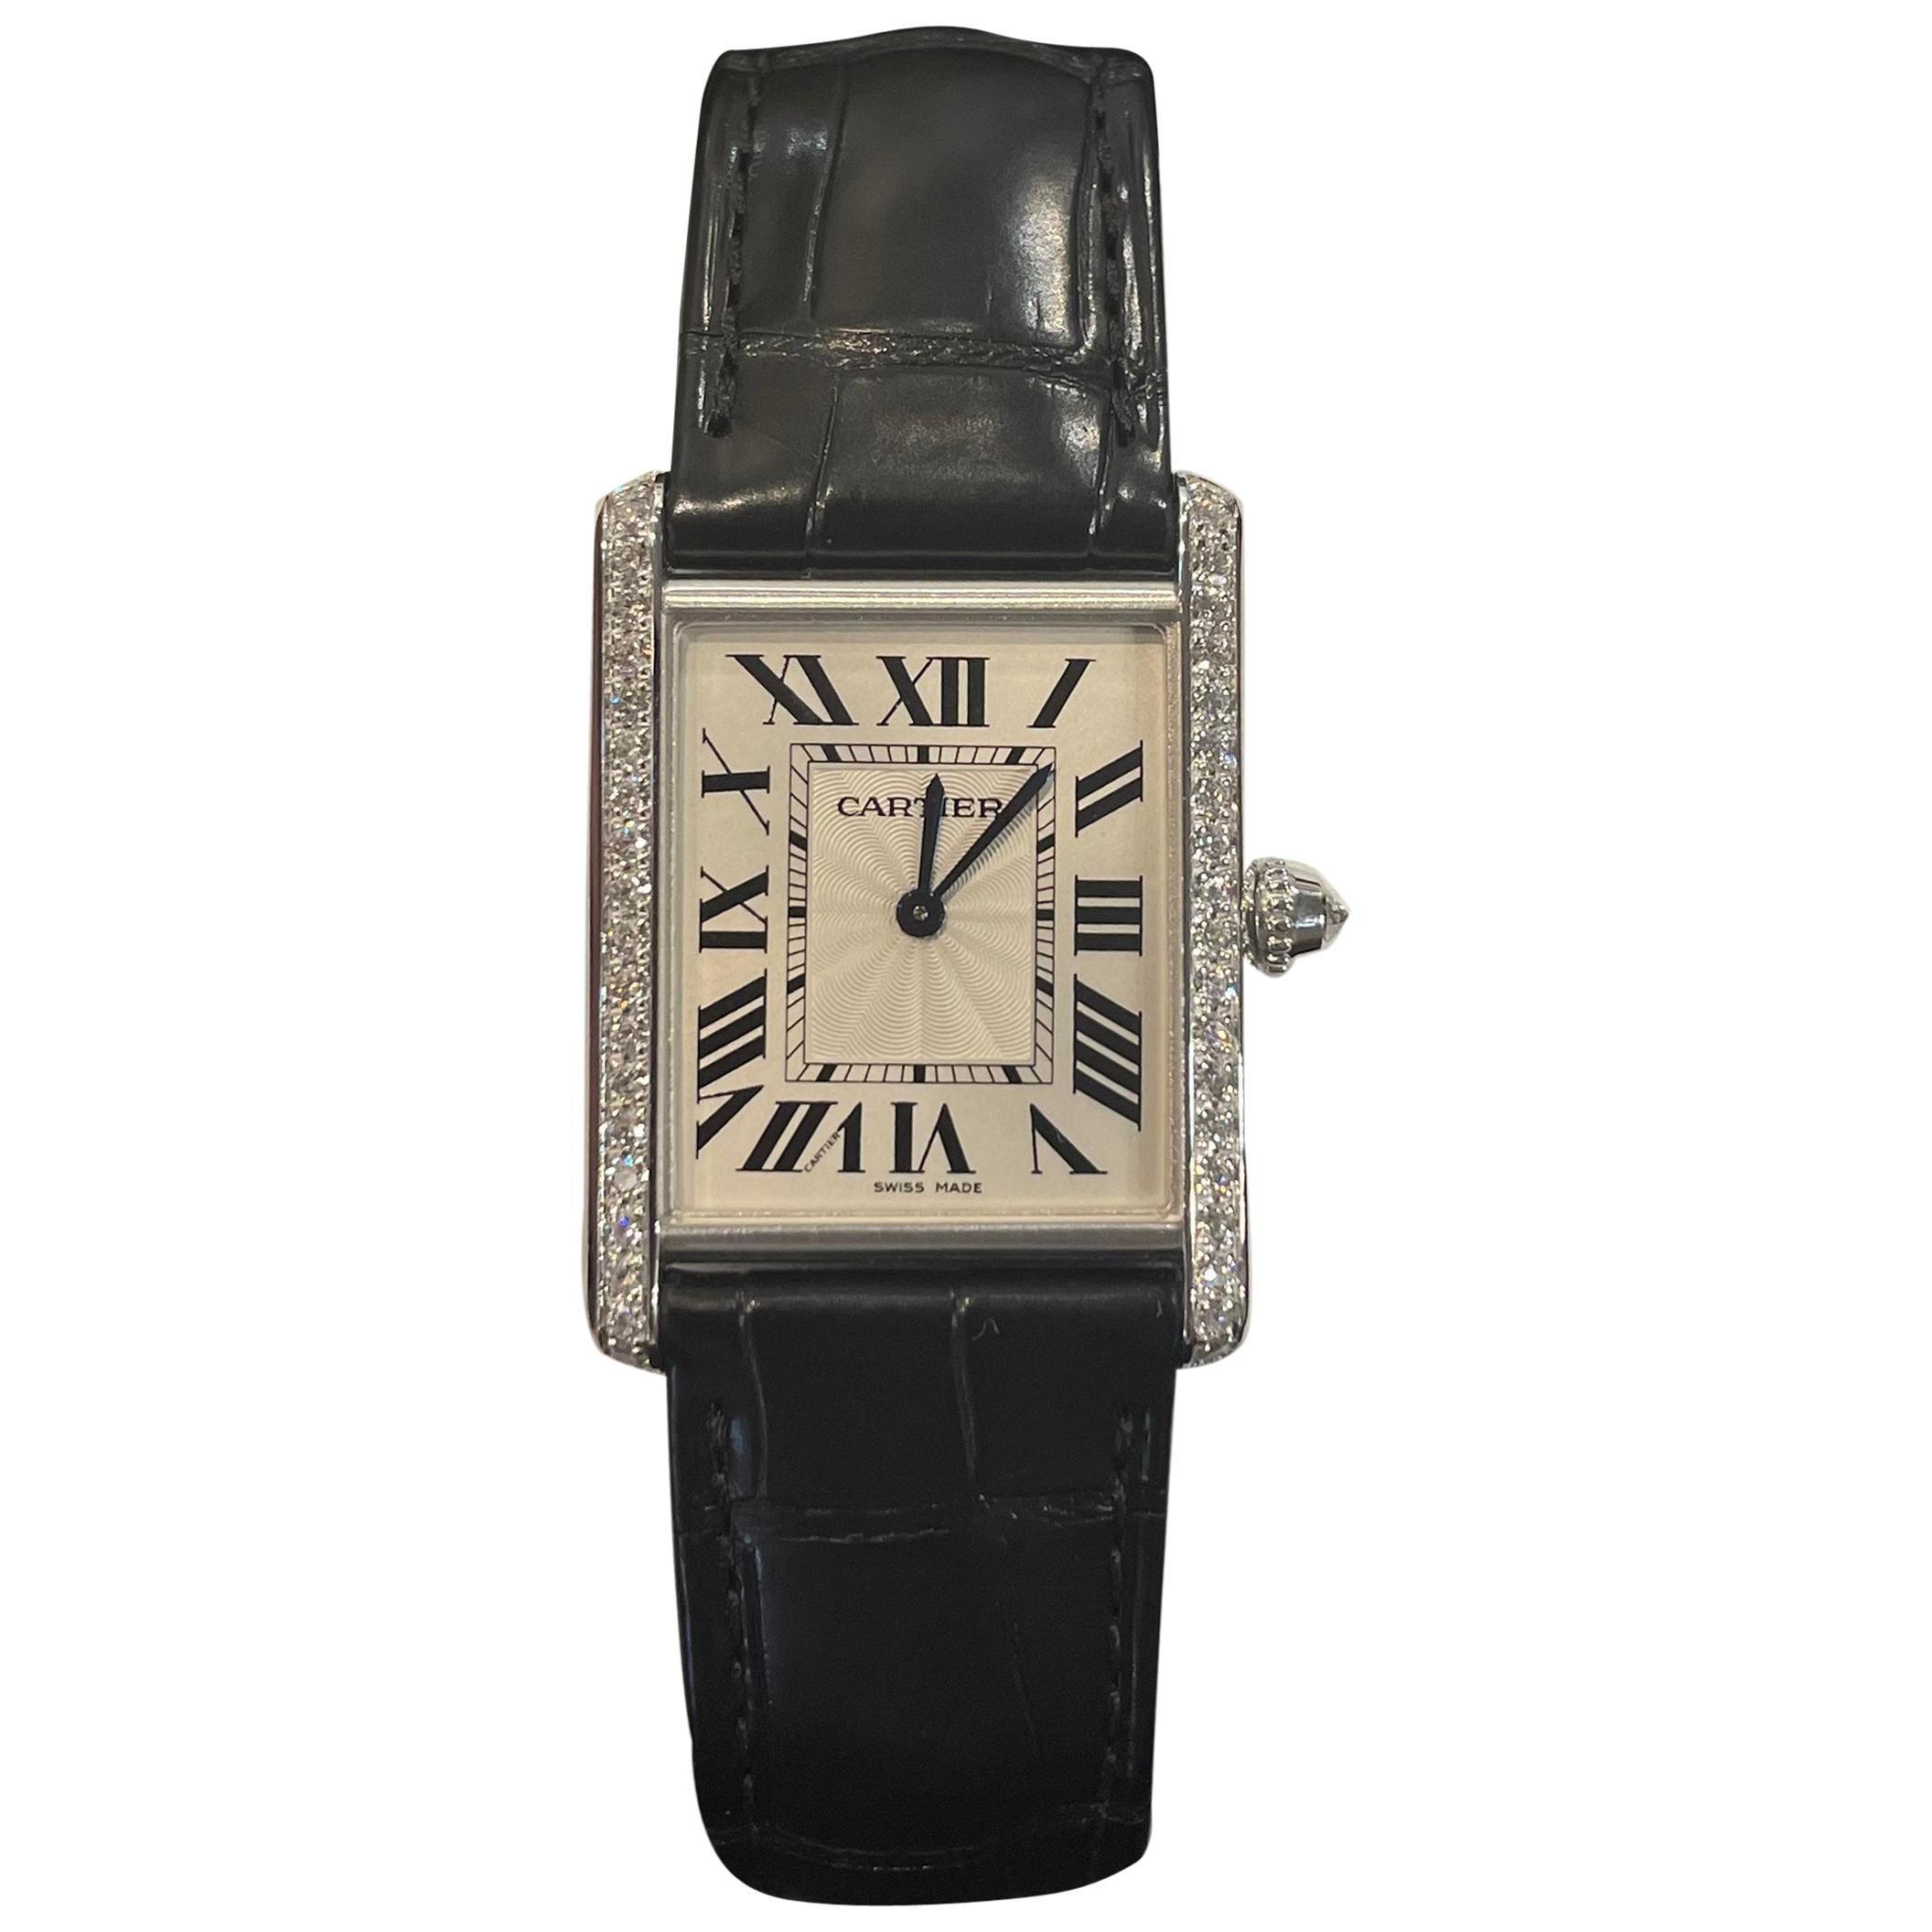 18 Karat White Gold Cartier Watch with Diamonds